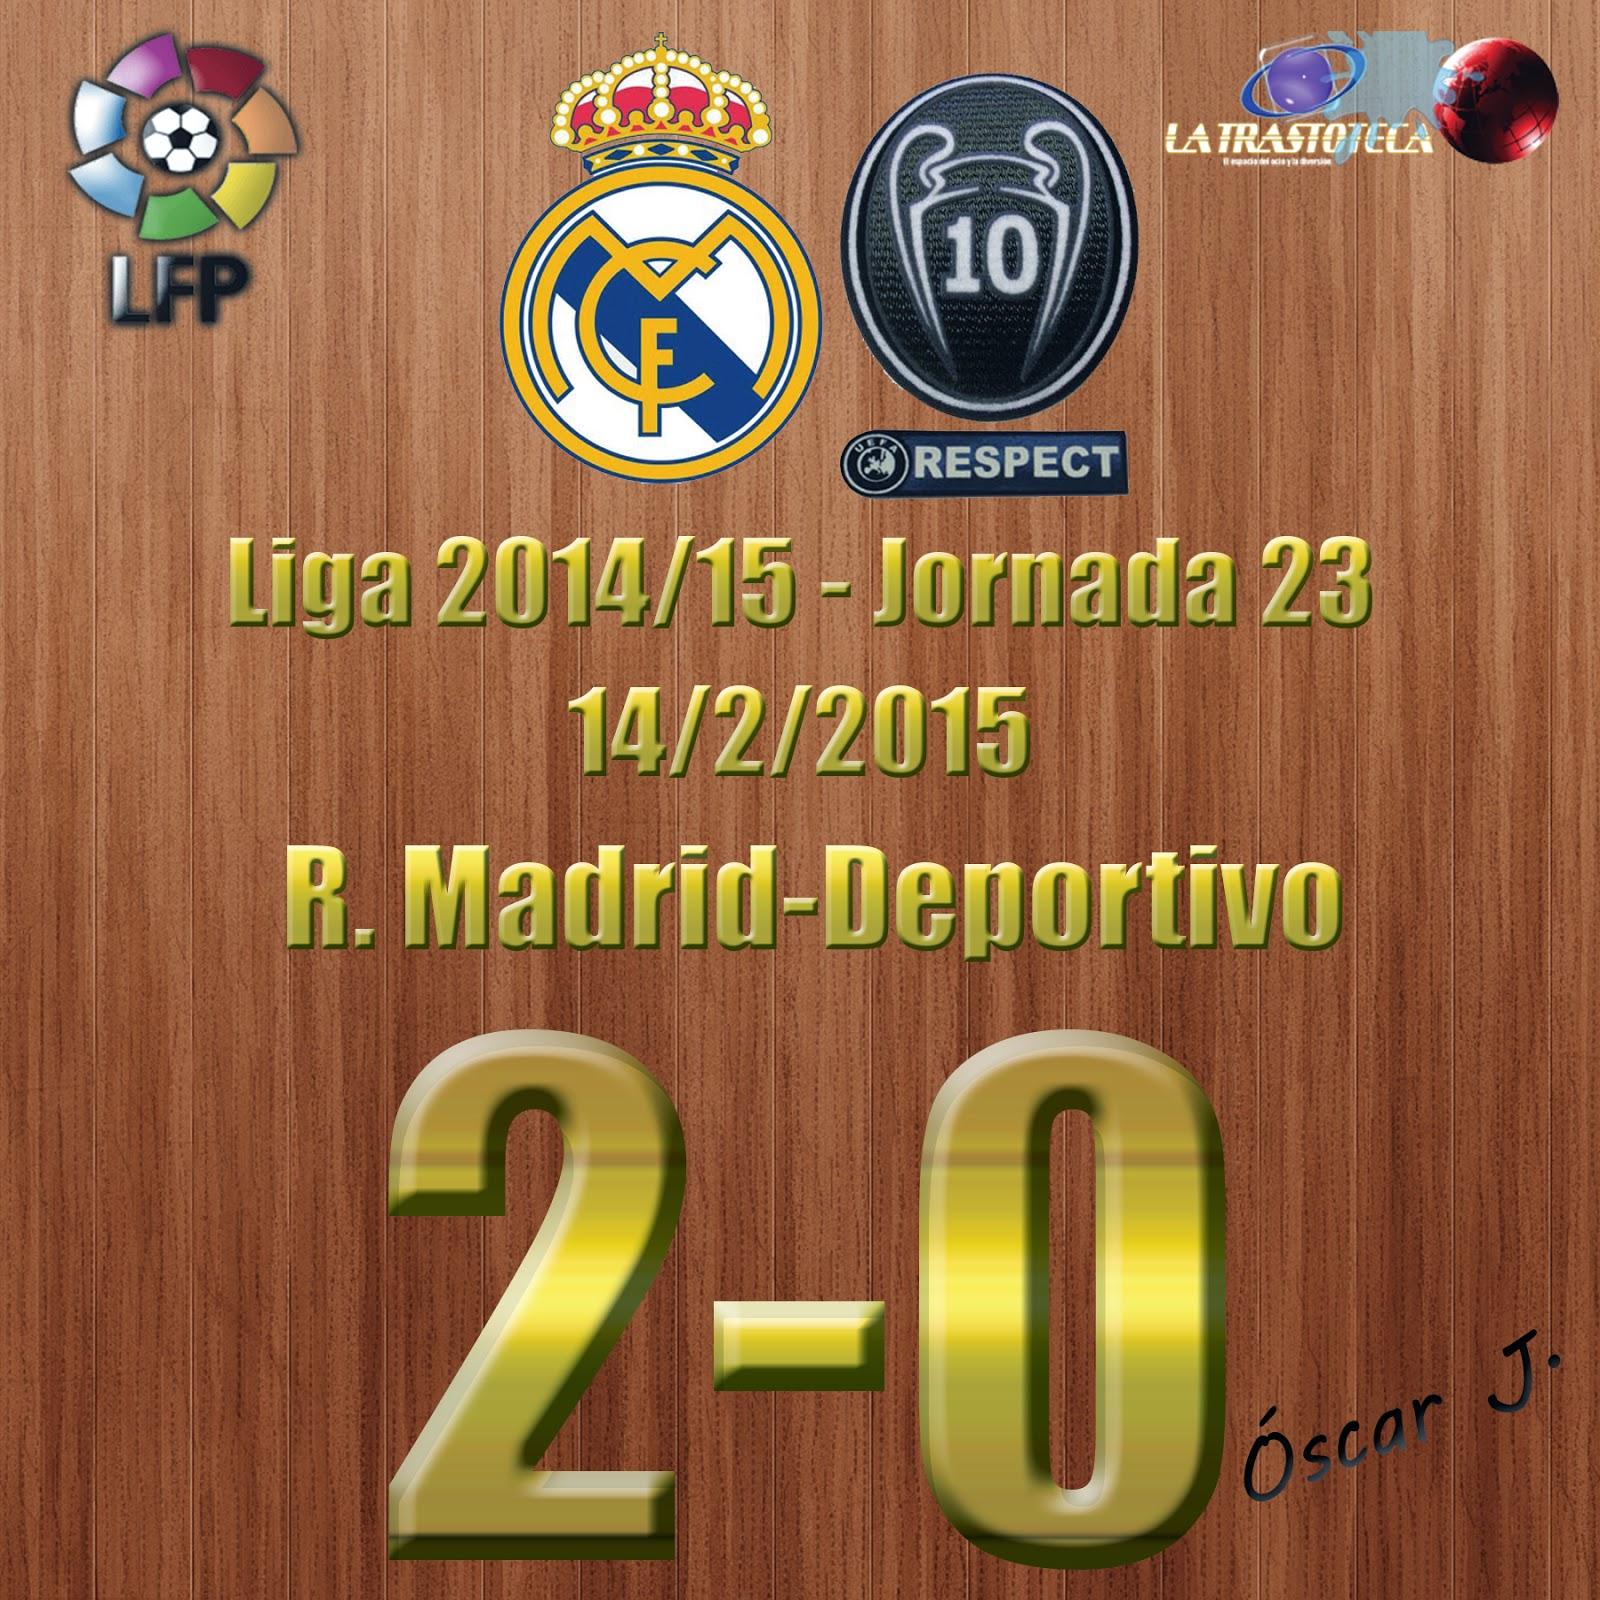 Isco (1-0) - Real Madrid 2-0 Deportivo - Liga 2014/15 - Jornada 23 - (14/2/2015)